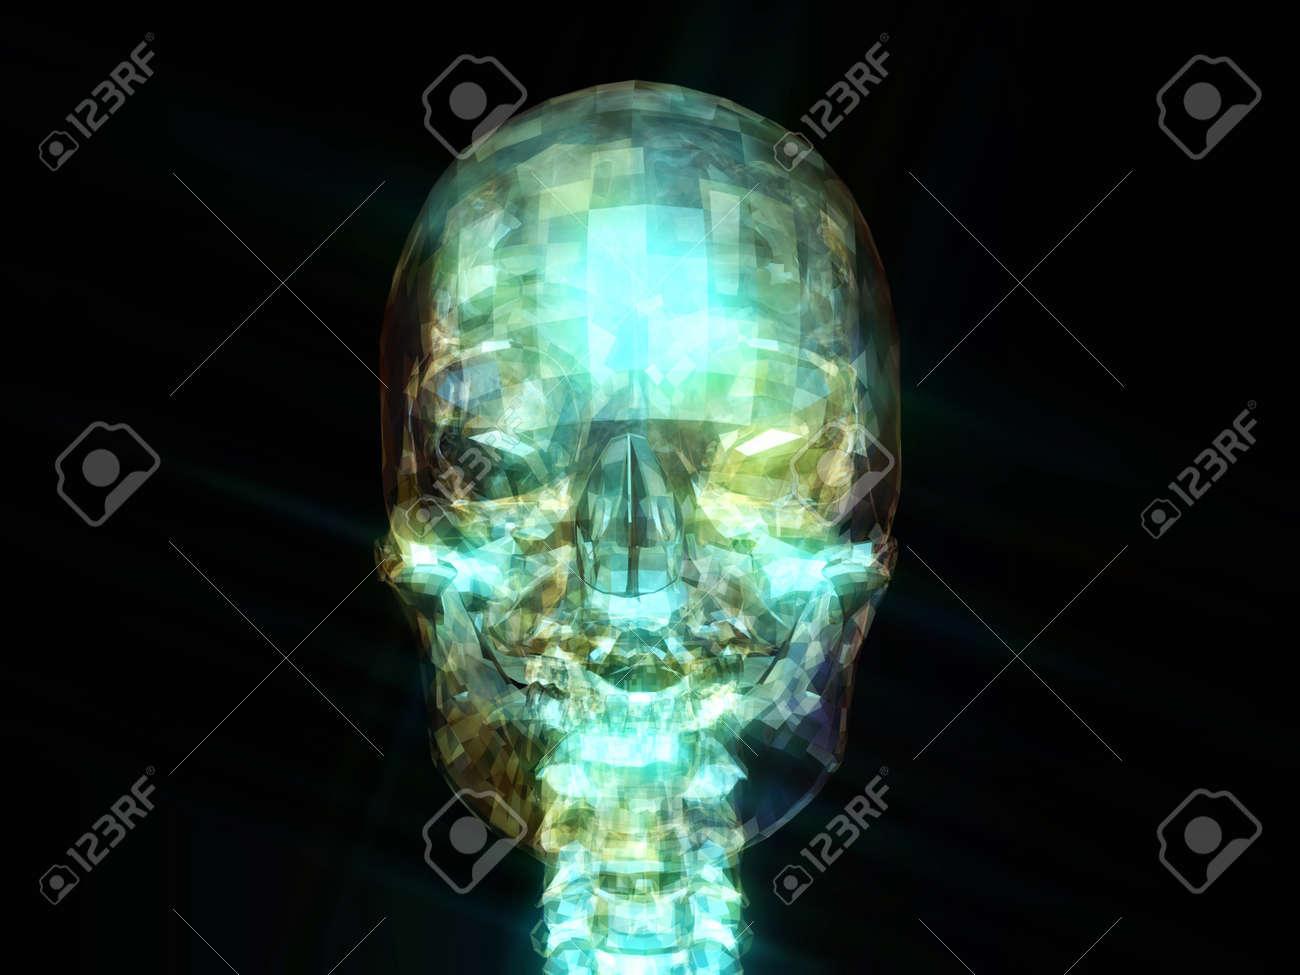 Digital Illustration of a human Skull Stock Photo - 21804210